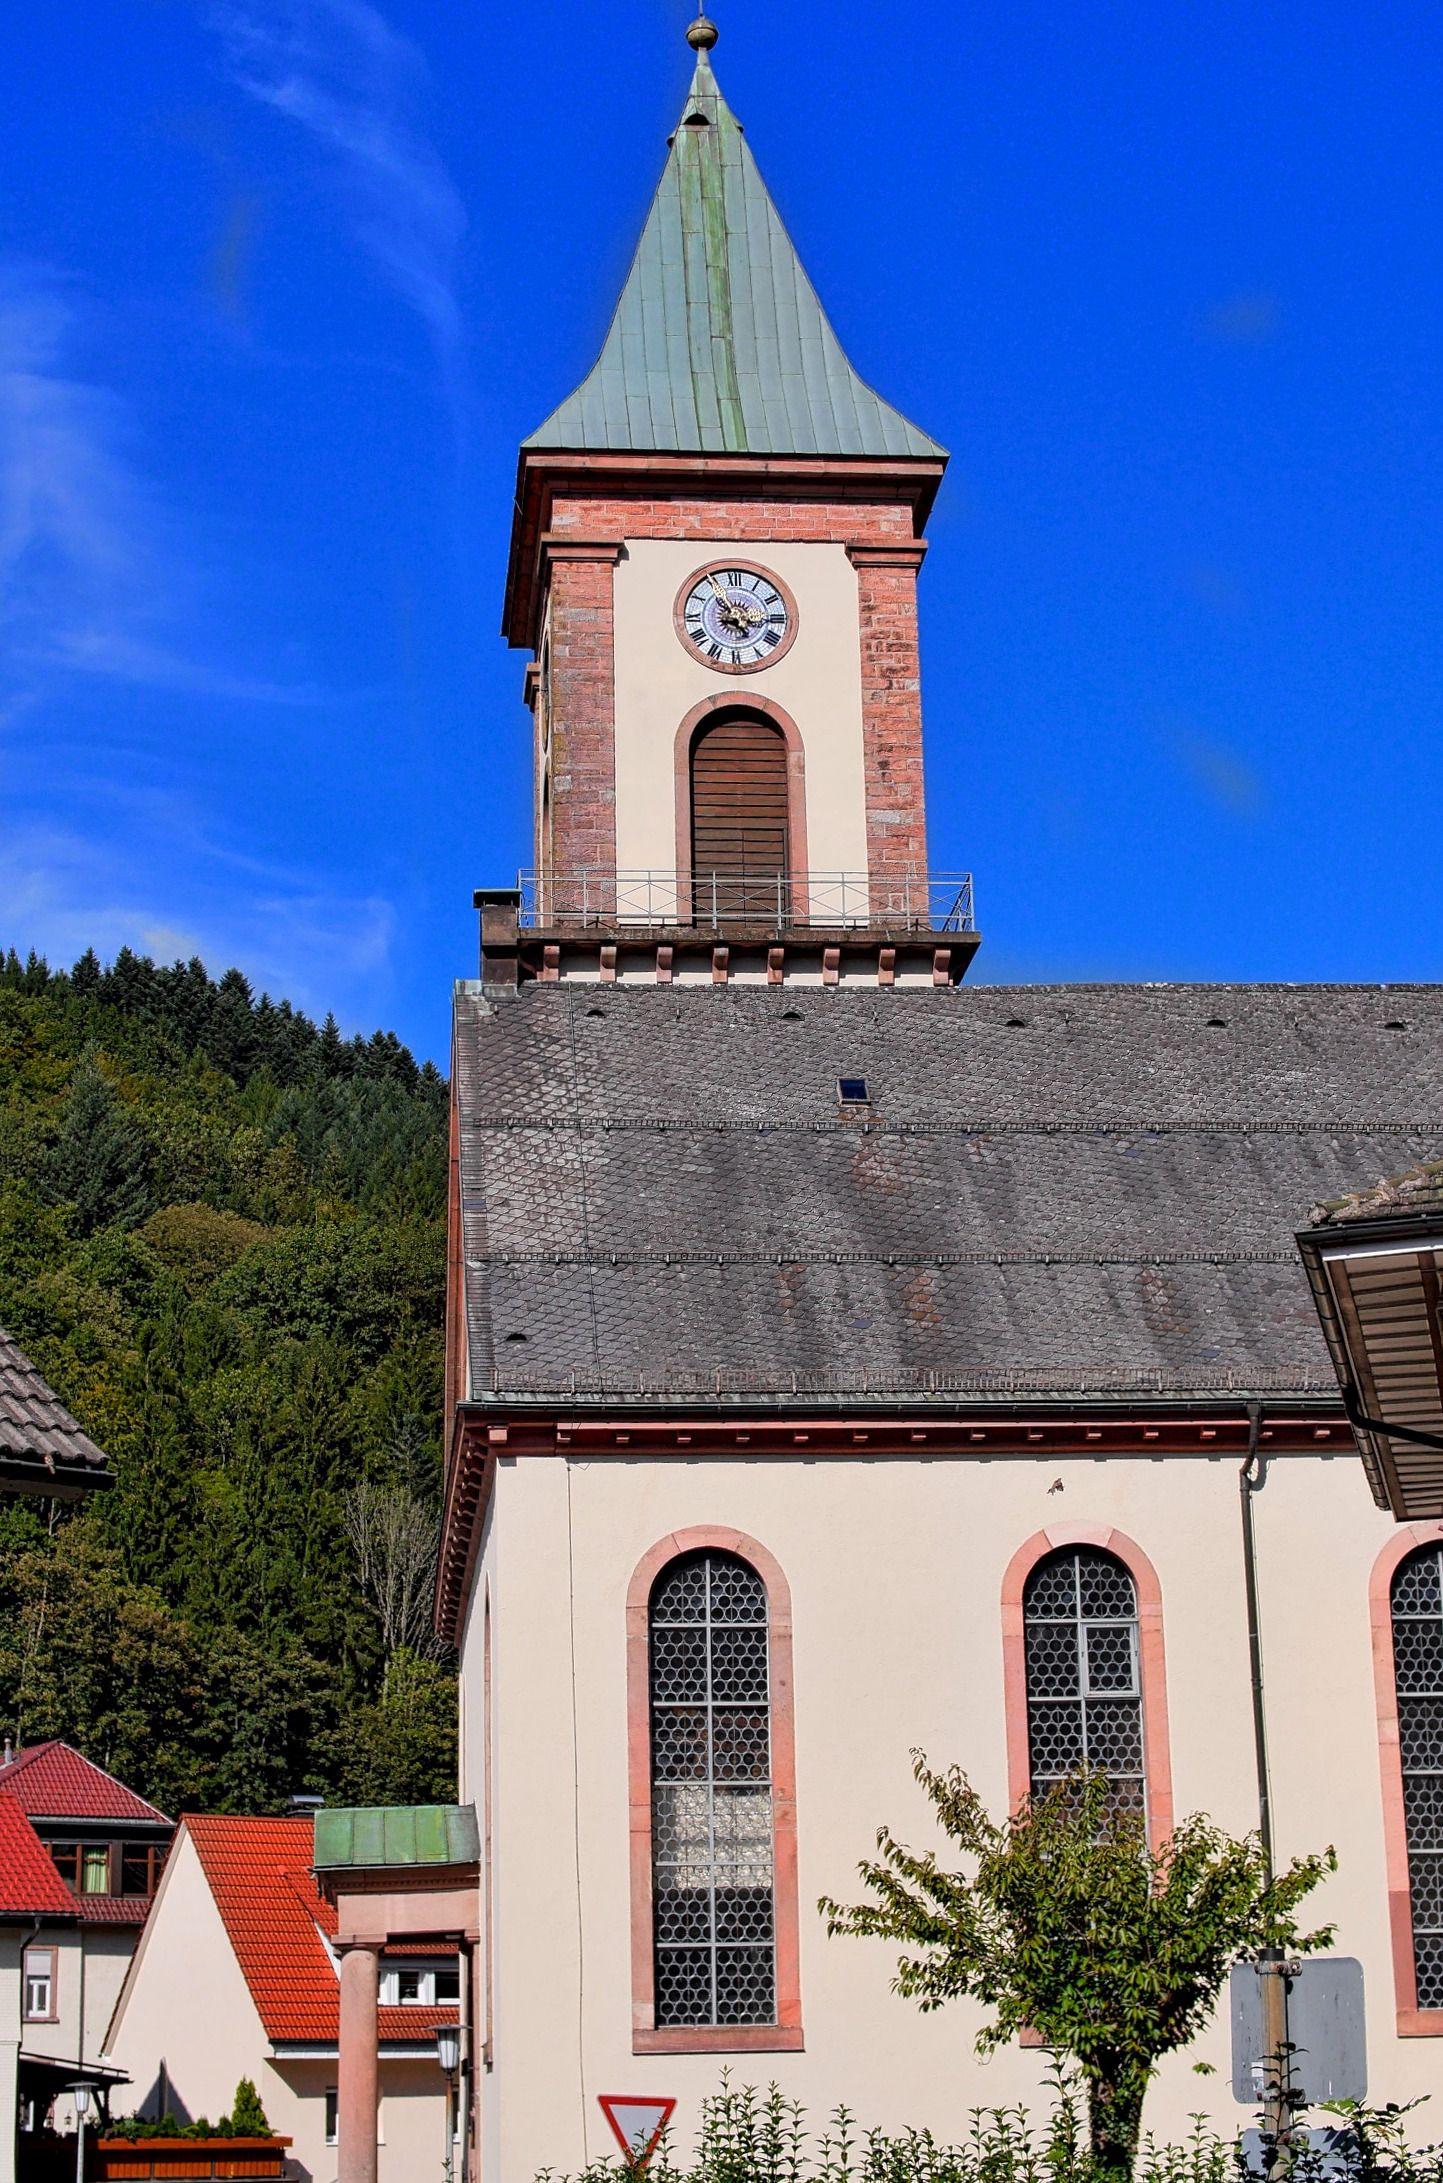 Kirche in Bad Peterstal Griesbach Black Forest Schwarzwald